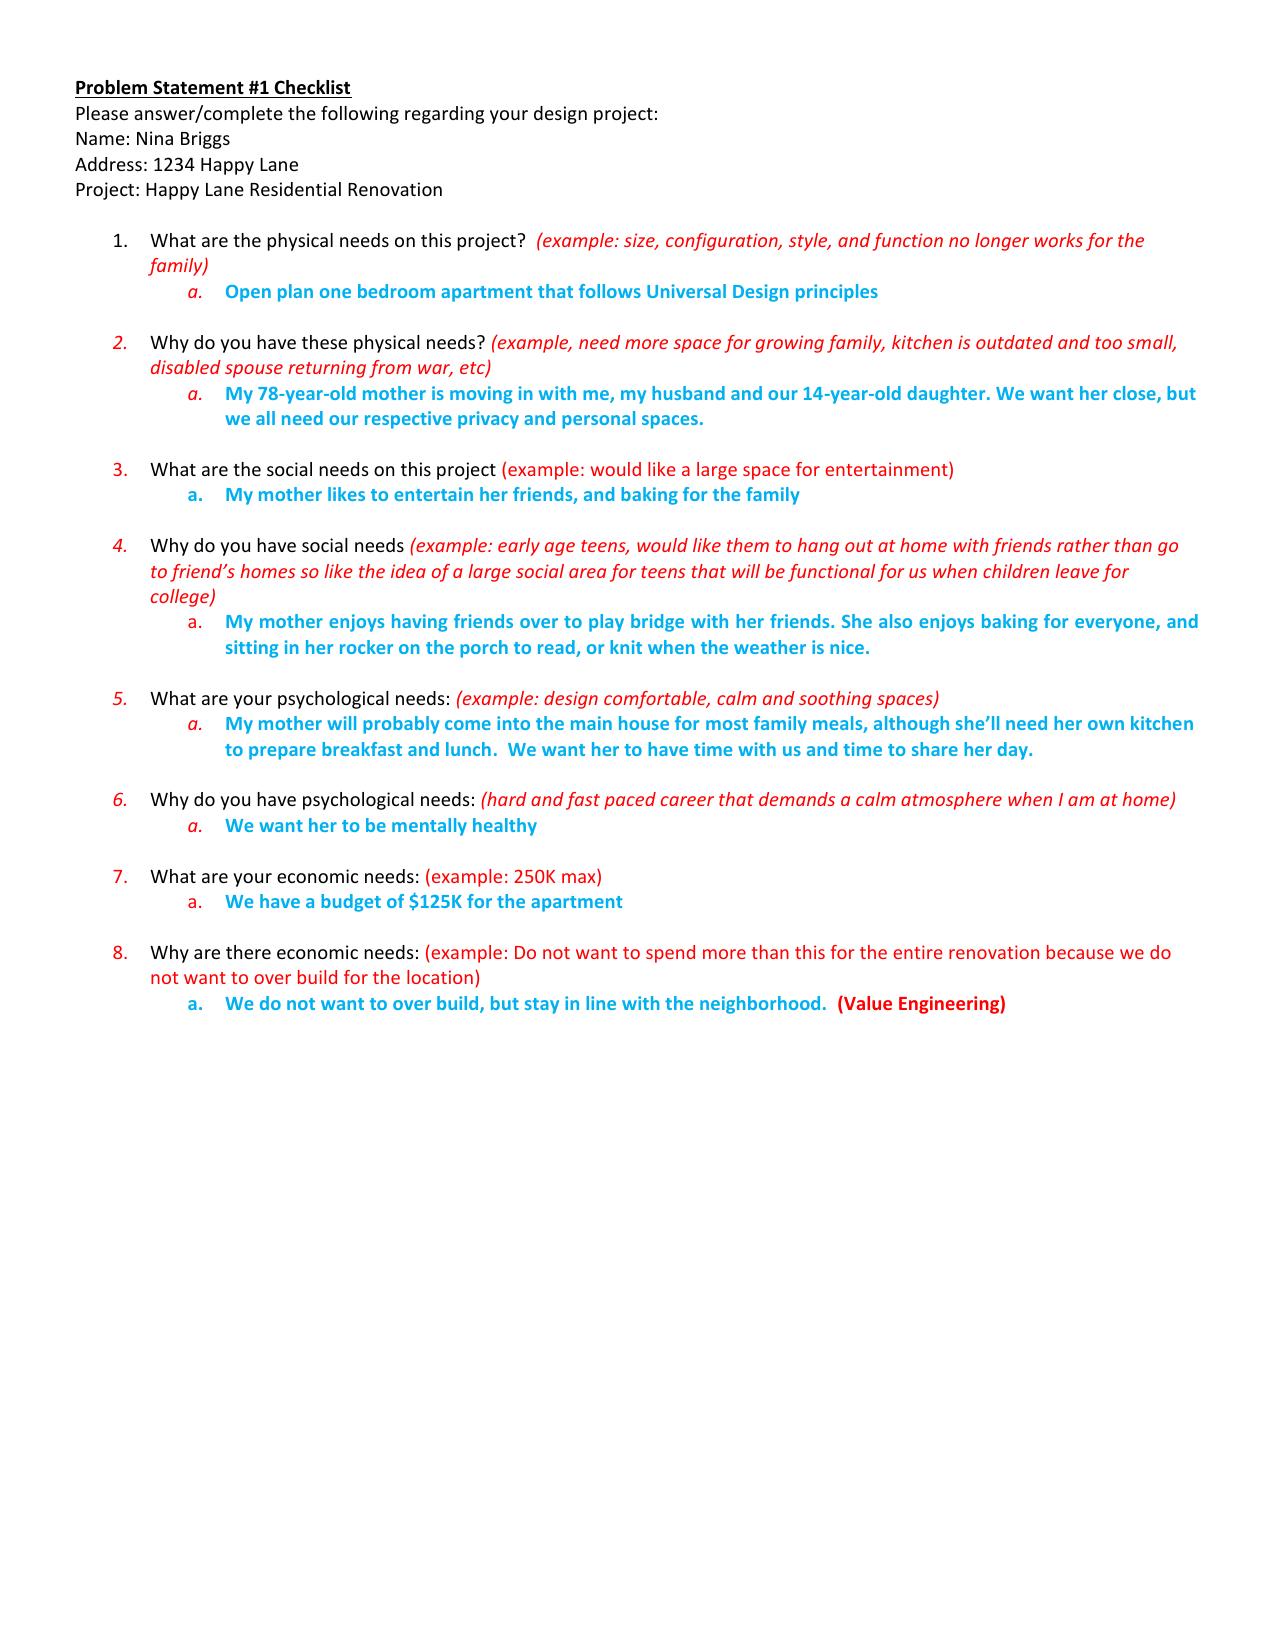 Problem Statement 1 Checklist Name Nina Briggs Address 1234 Happy